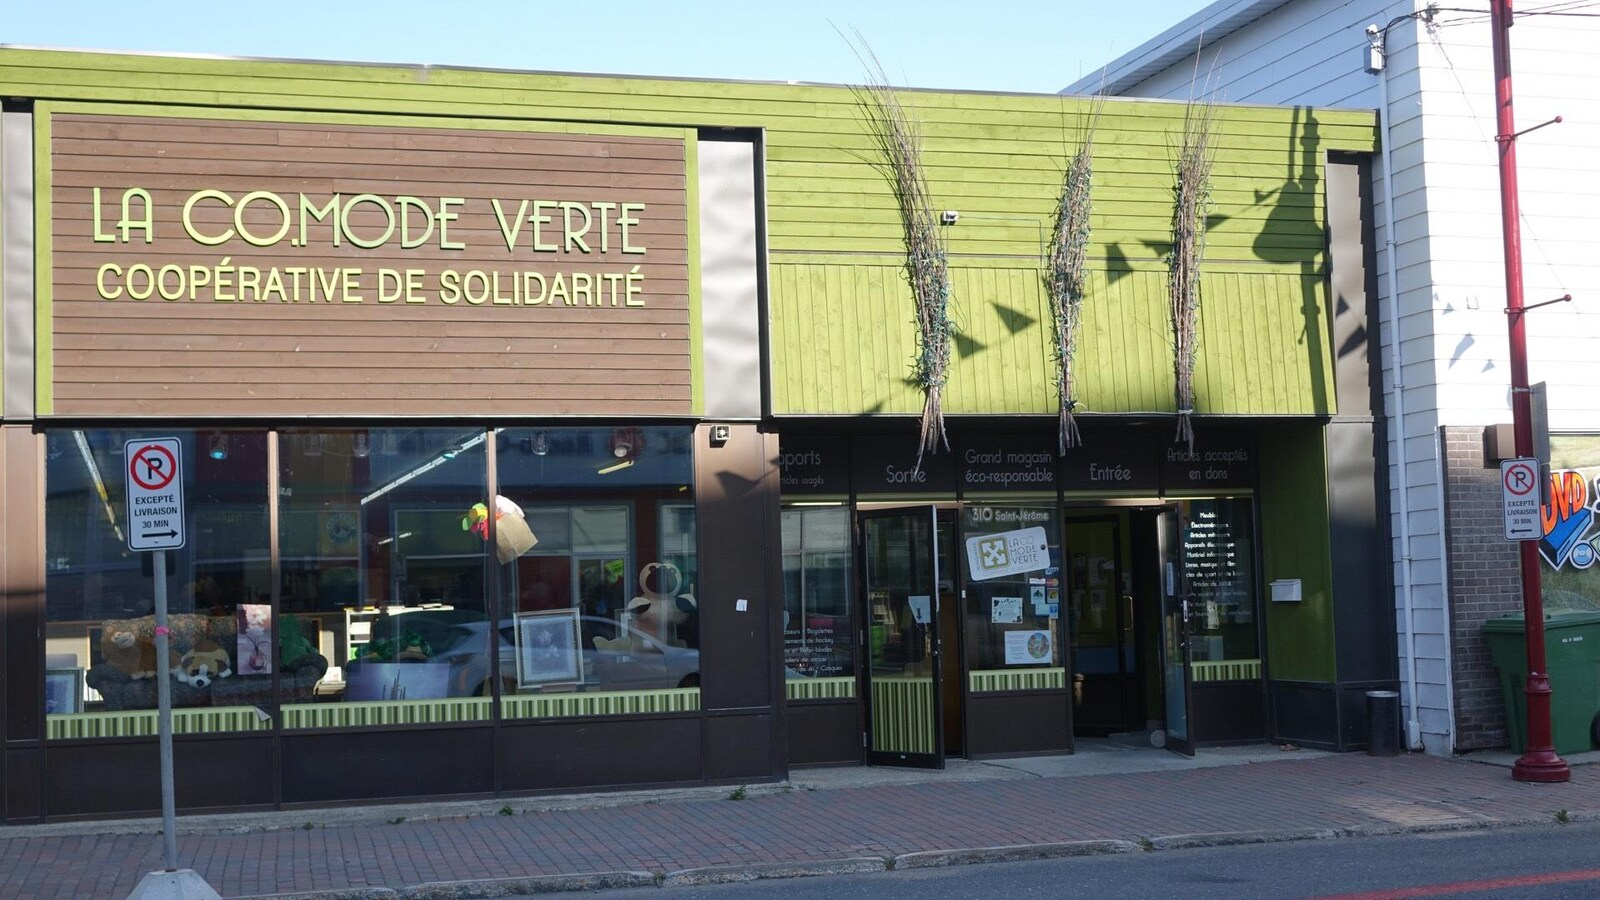 Enquete De La Surete Du Quebec A La Co Mode Verte Ici Radio Canada Ca